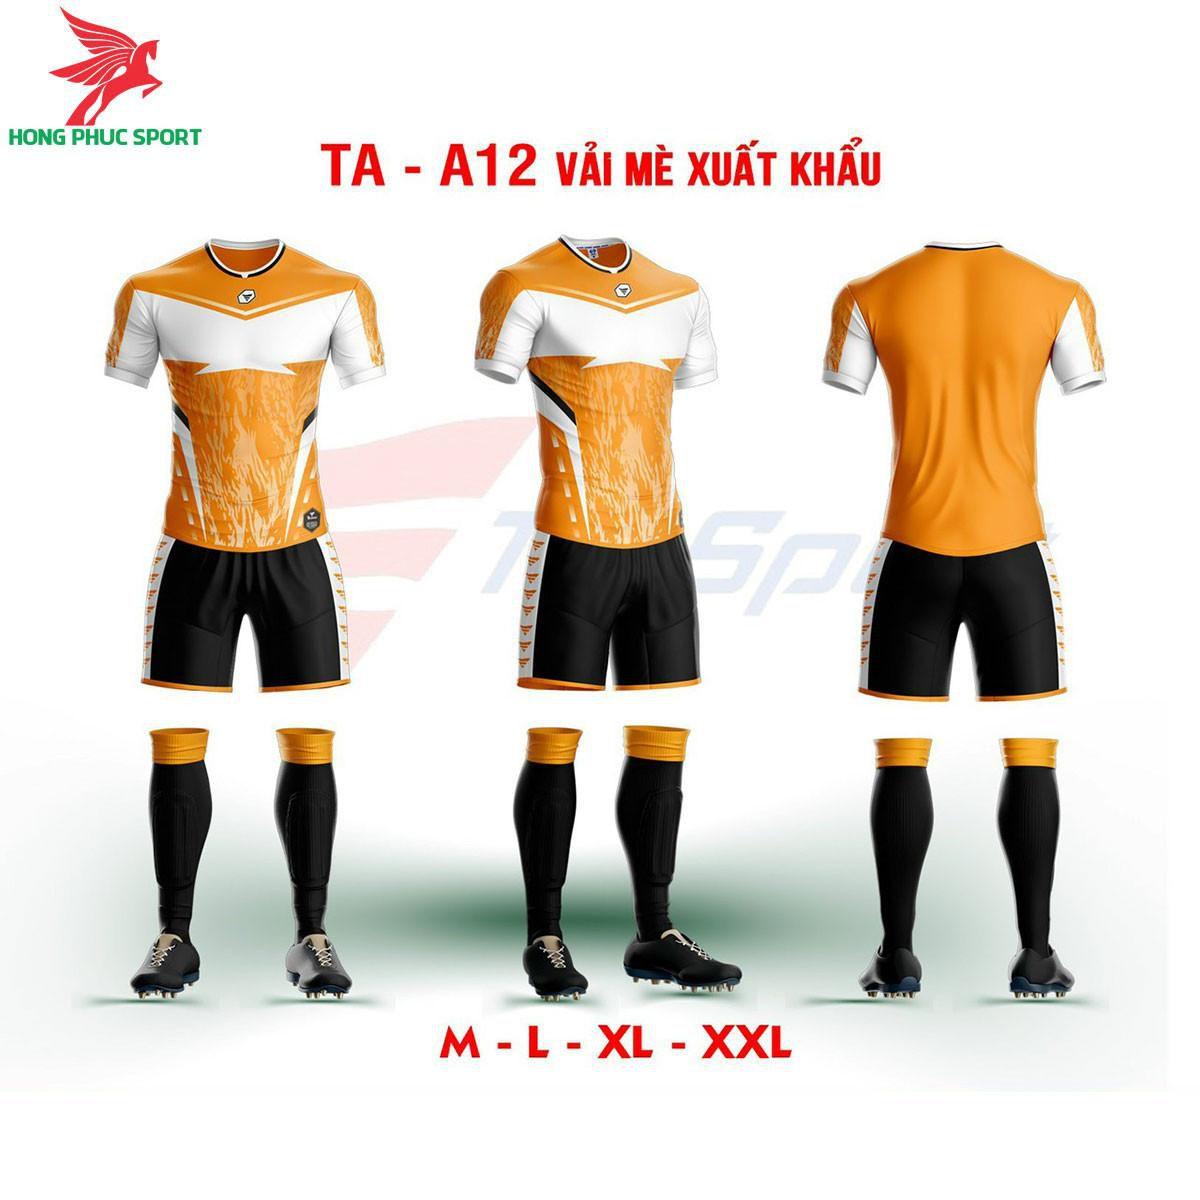 https://cdn.hongphucsport.com/unsafe/s4.shopbay.vn/files/285/ao-khong-logo-truong-an-ta-a12-mau-cam-604747255c5e5.jpg